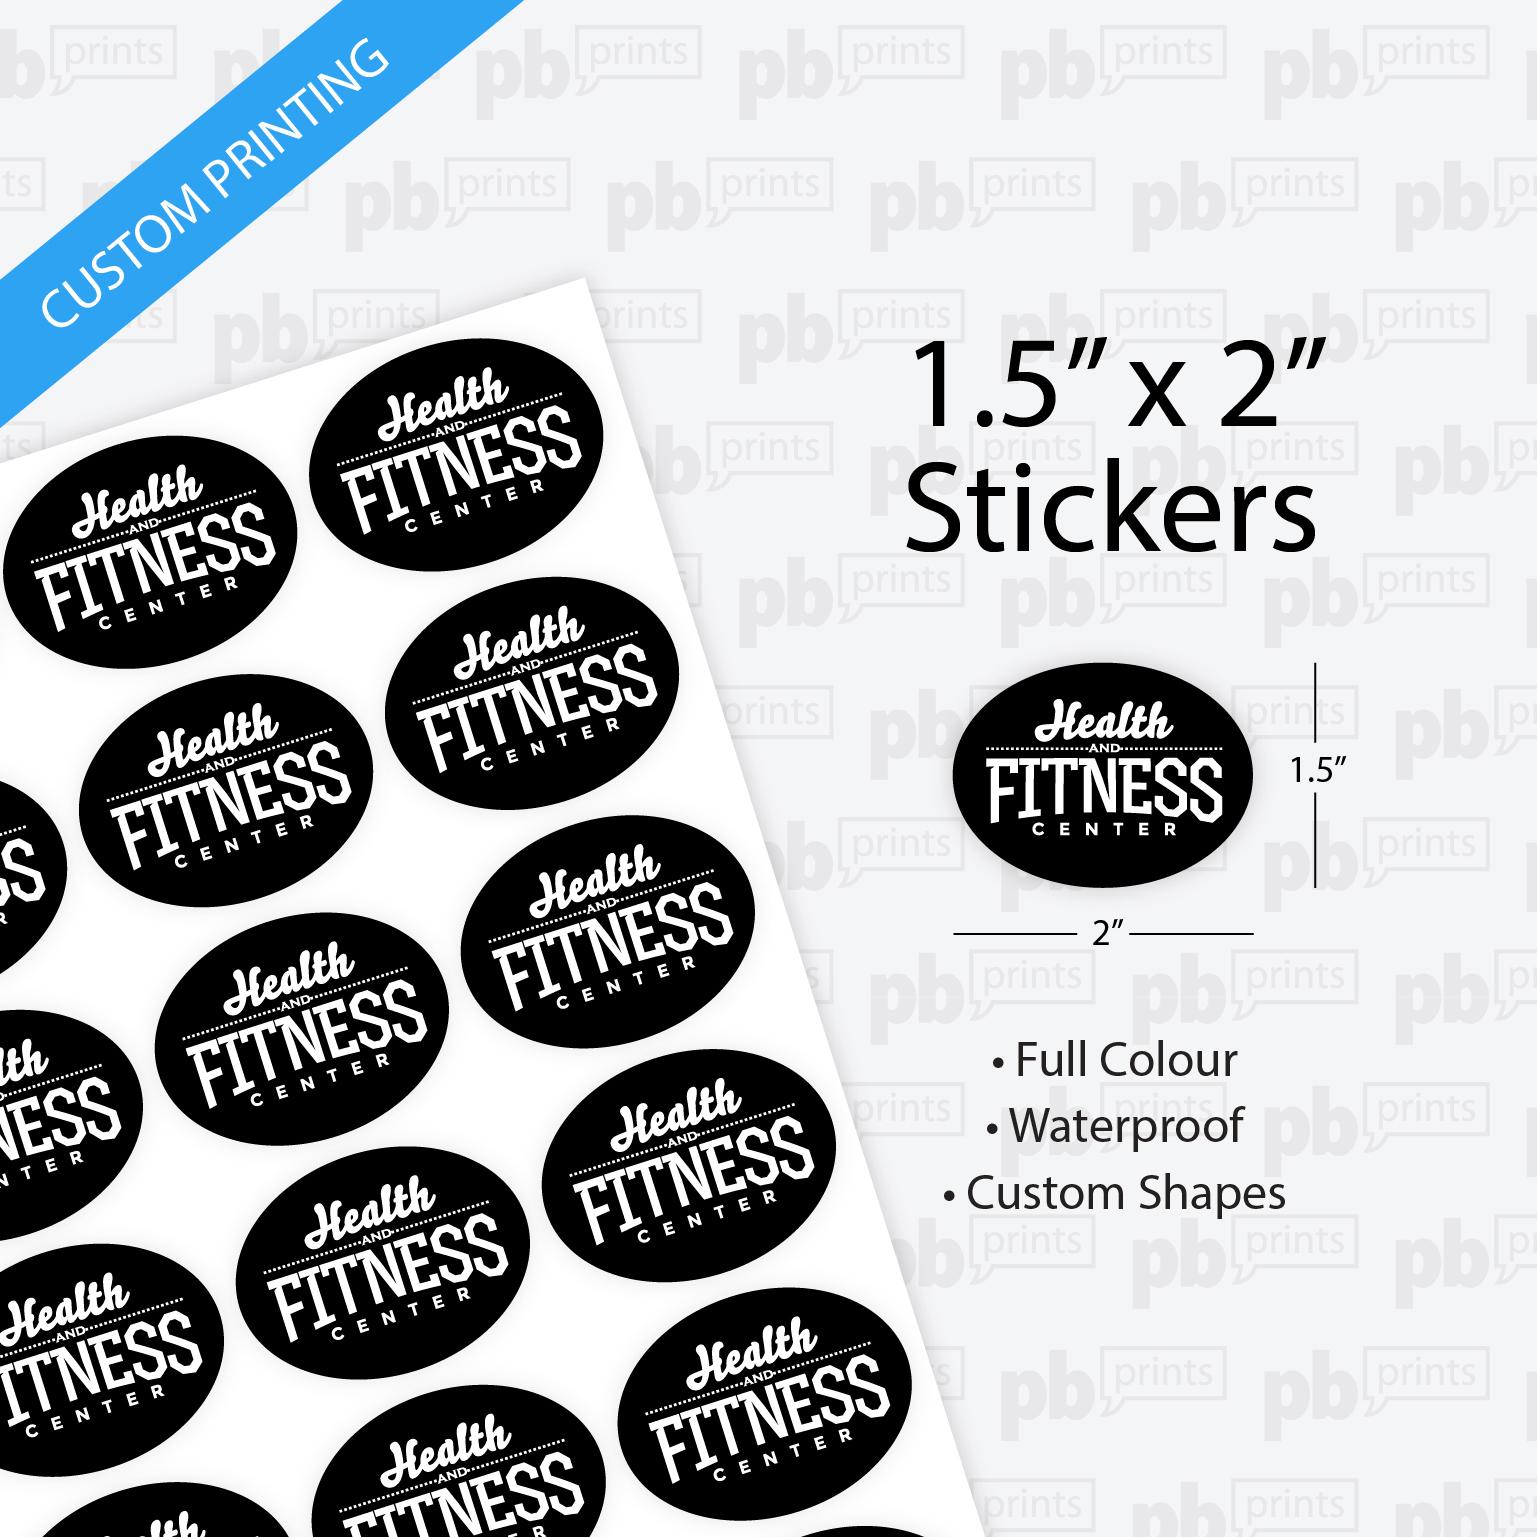 1 5 x 2 inch stickers